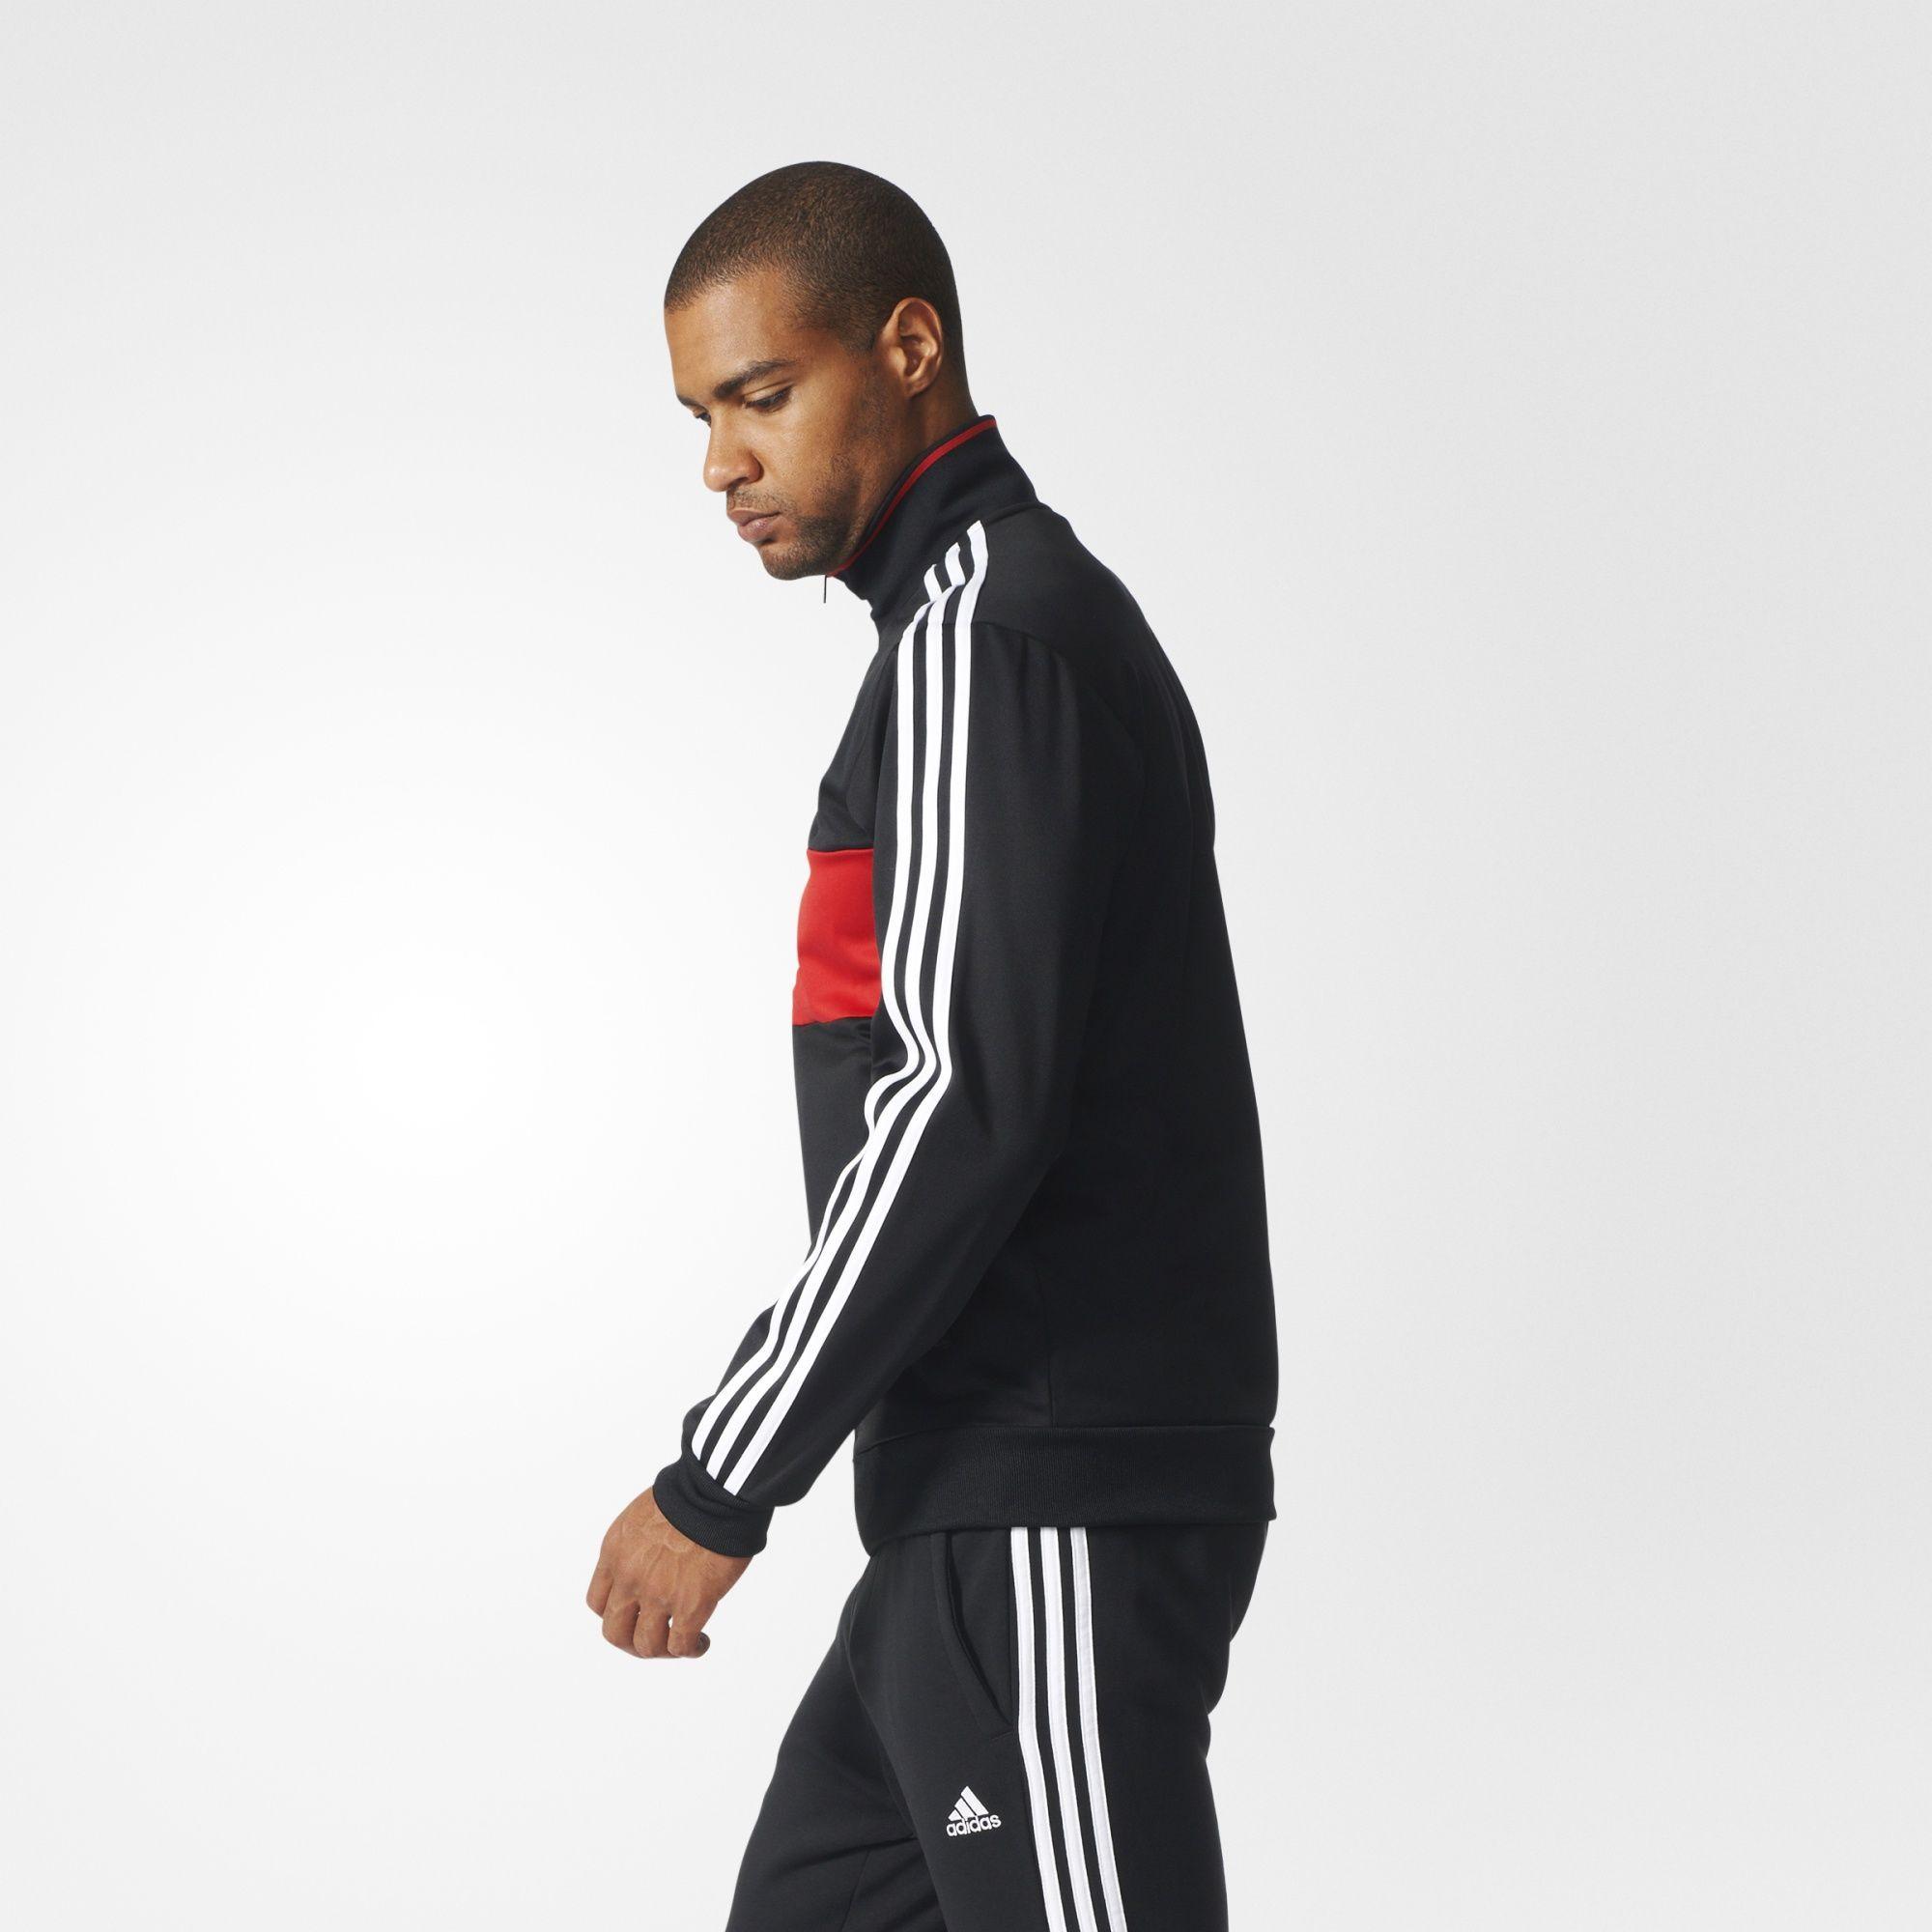 625170240f6 adidas - Manchester United 3-Stripes Track Jacket